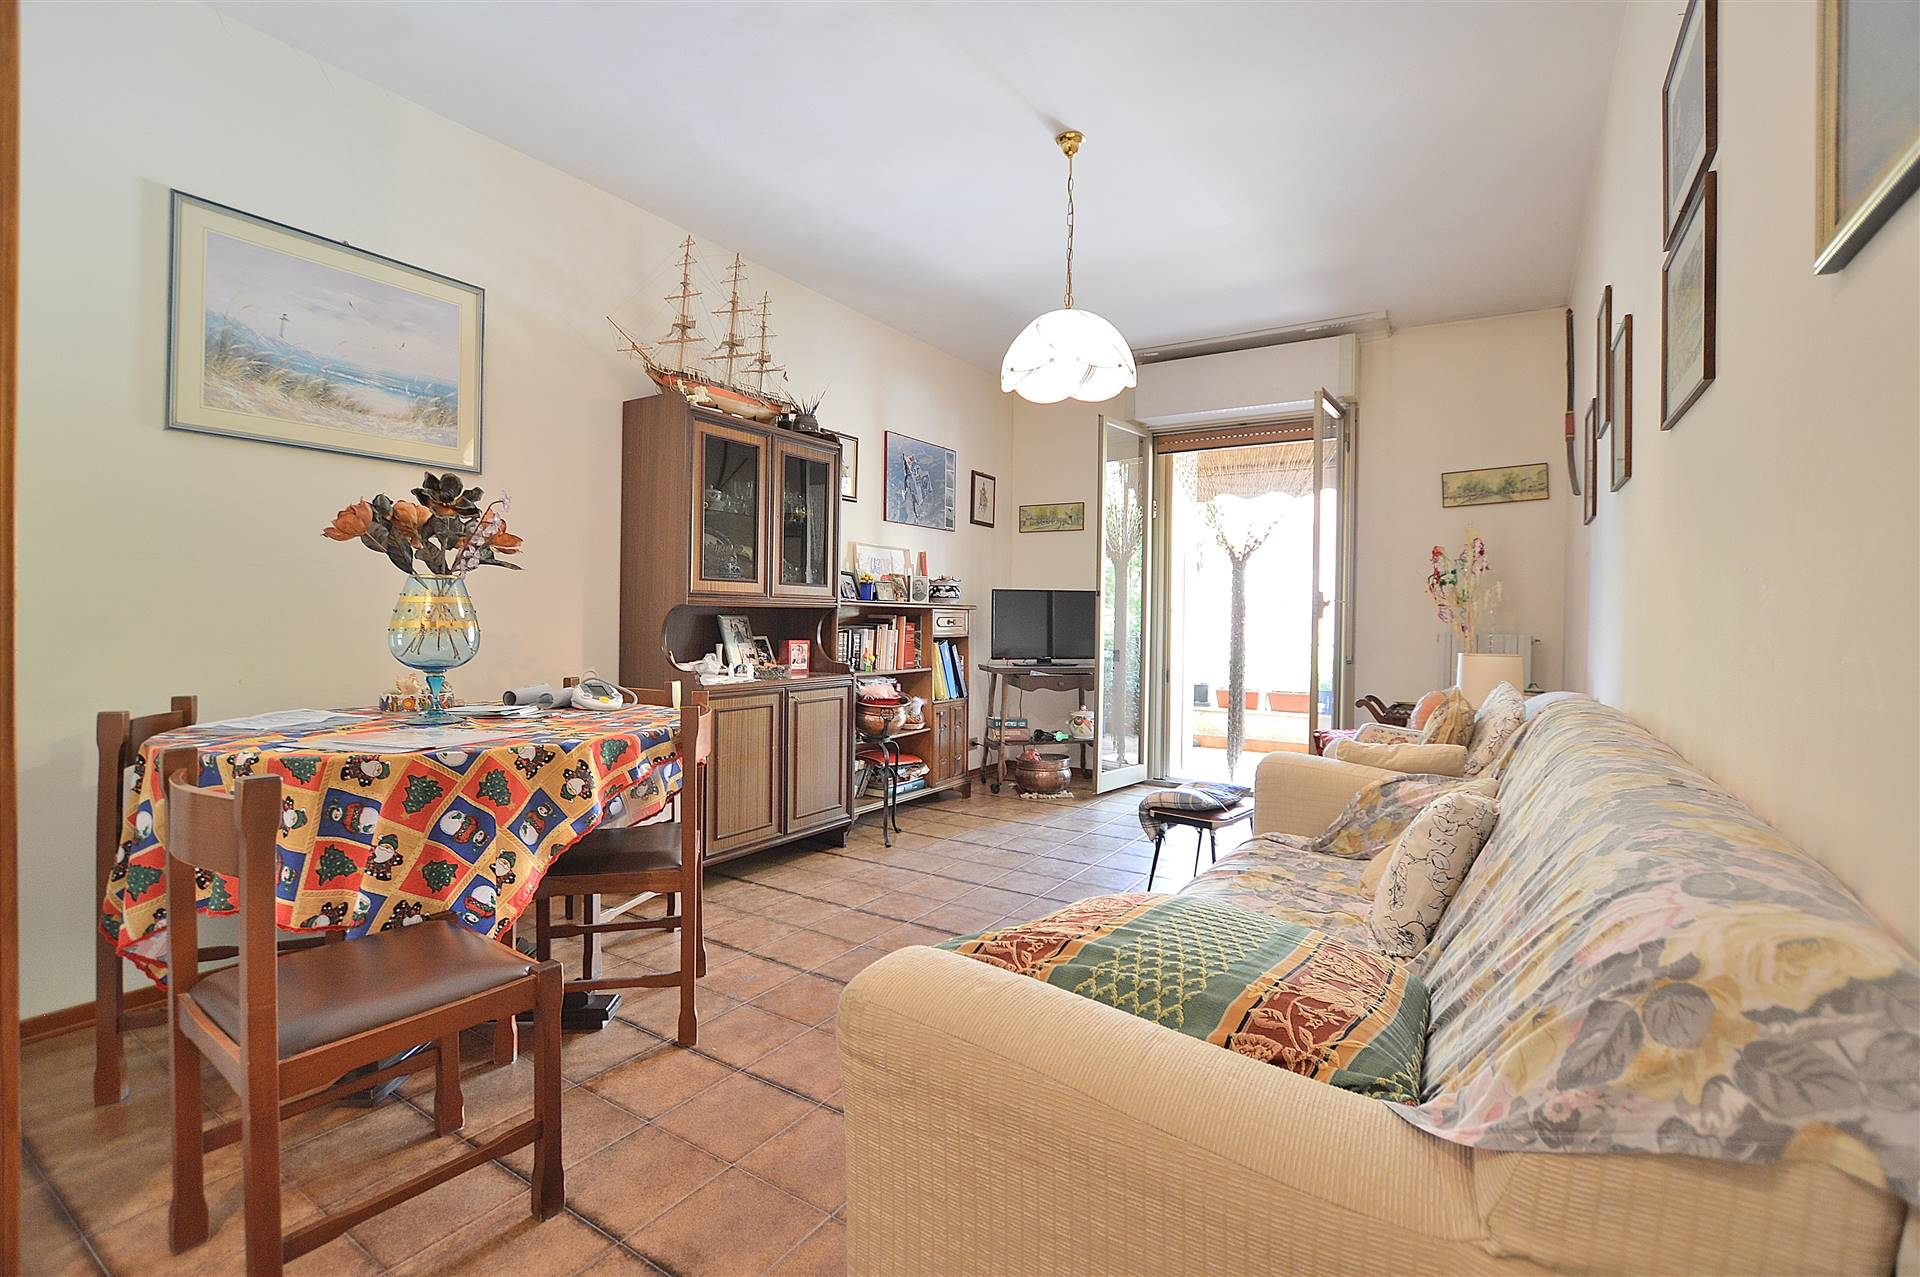 MONTEAPERTI, CASTELNUOVO BERARDENGA, Apartment for sale, Habitable, Heating Individual heating system, Energetic class: G, Epi: 175 kwh/m2 year,